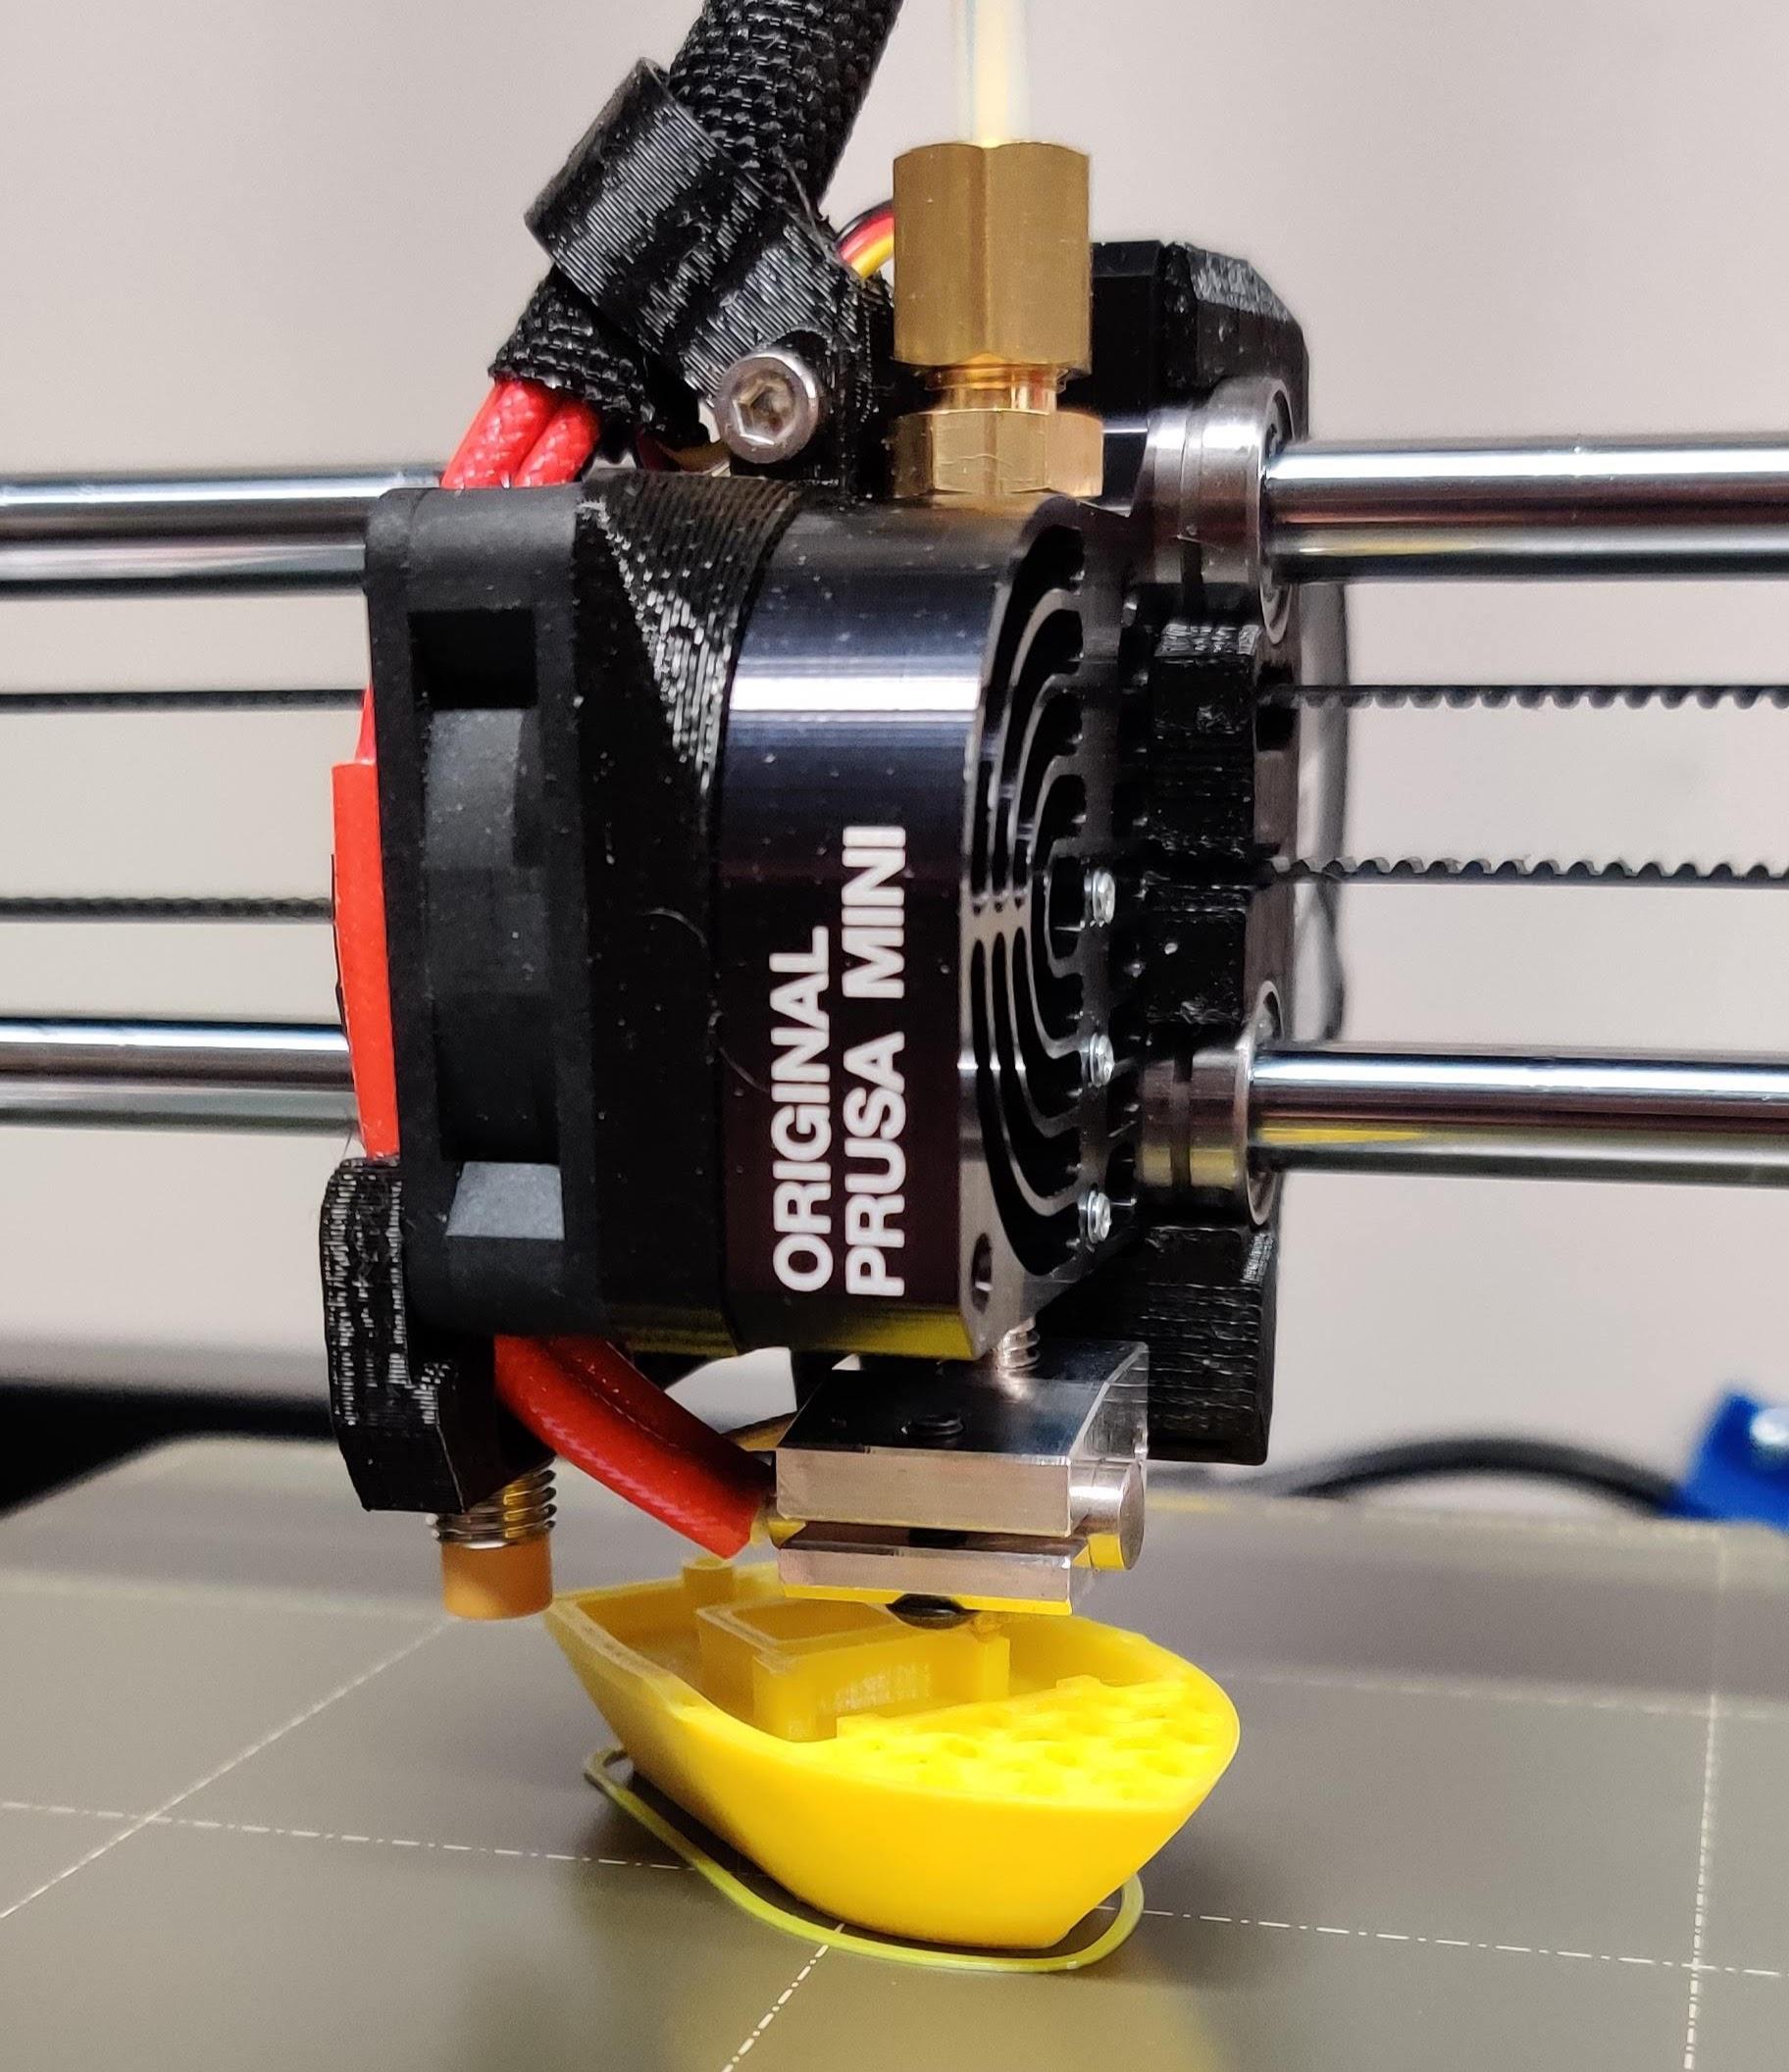 3D Printing Benchy